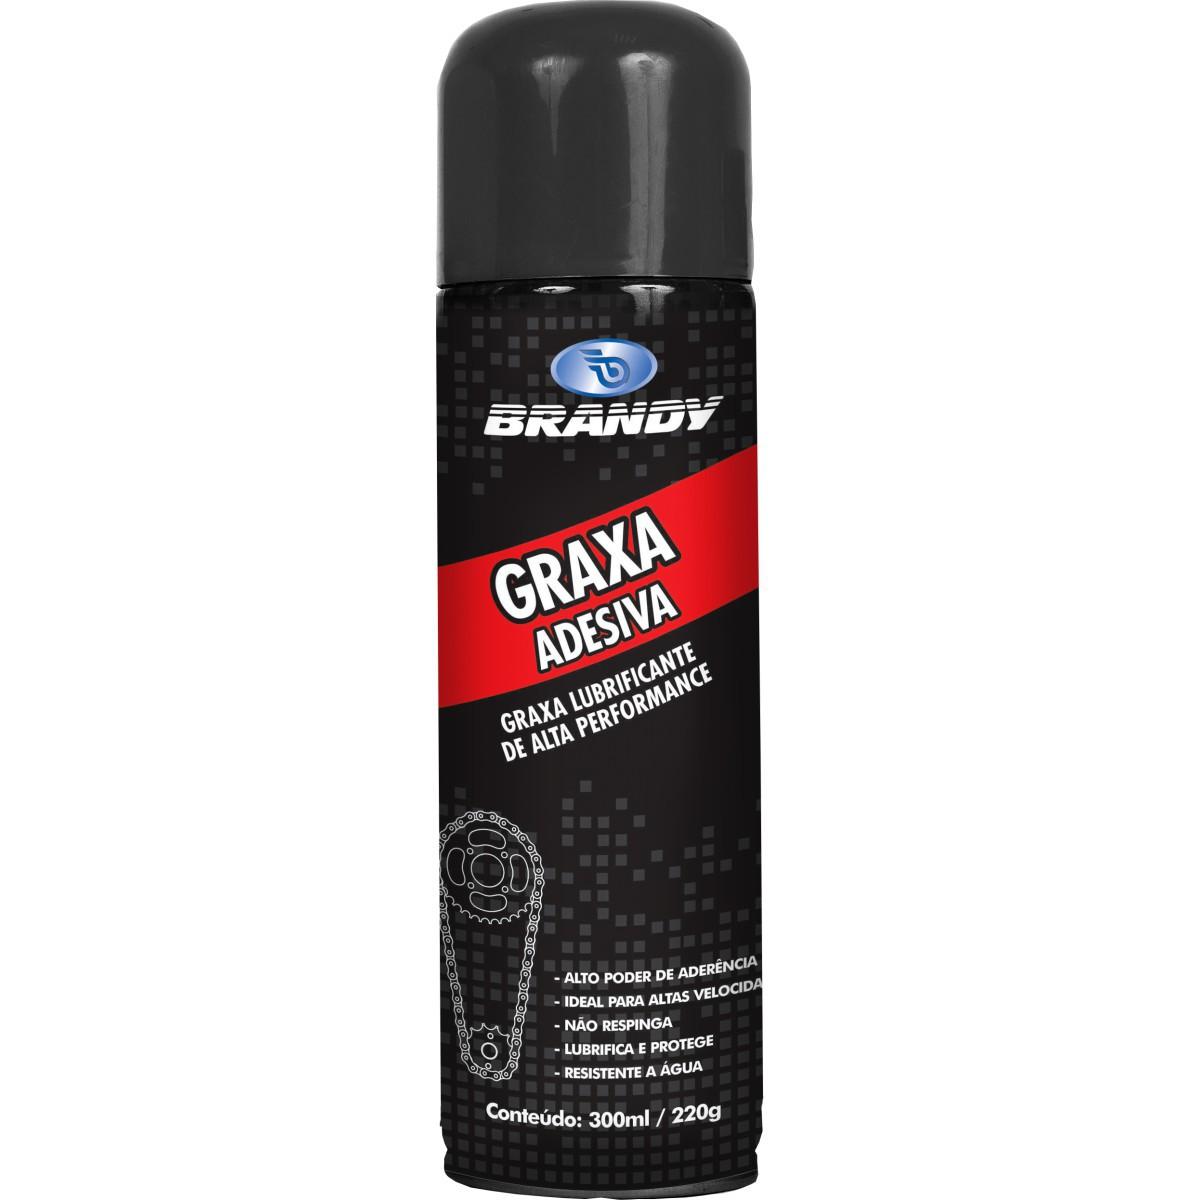 KIT C/ 3 GRAXA BRANDY ADESIVA SPRAY LATA 300ml/220g